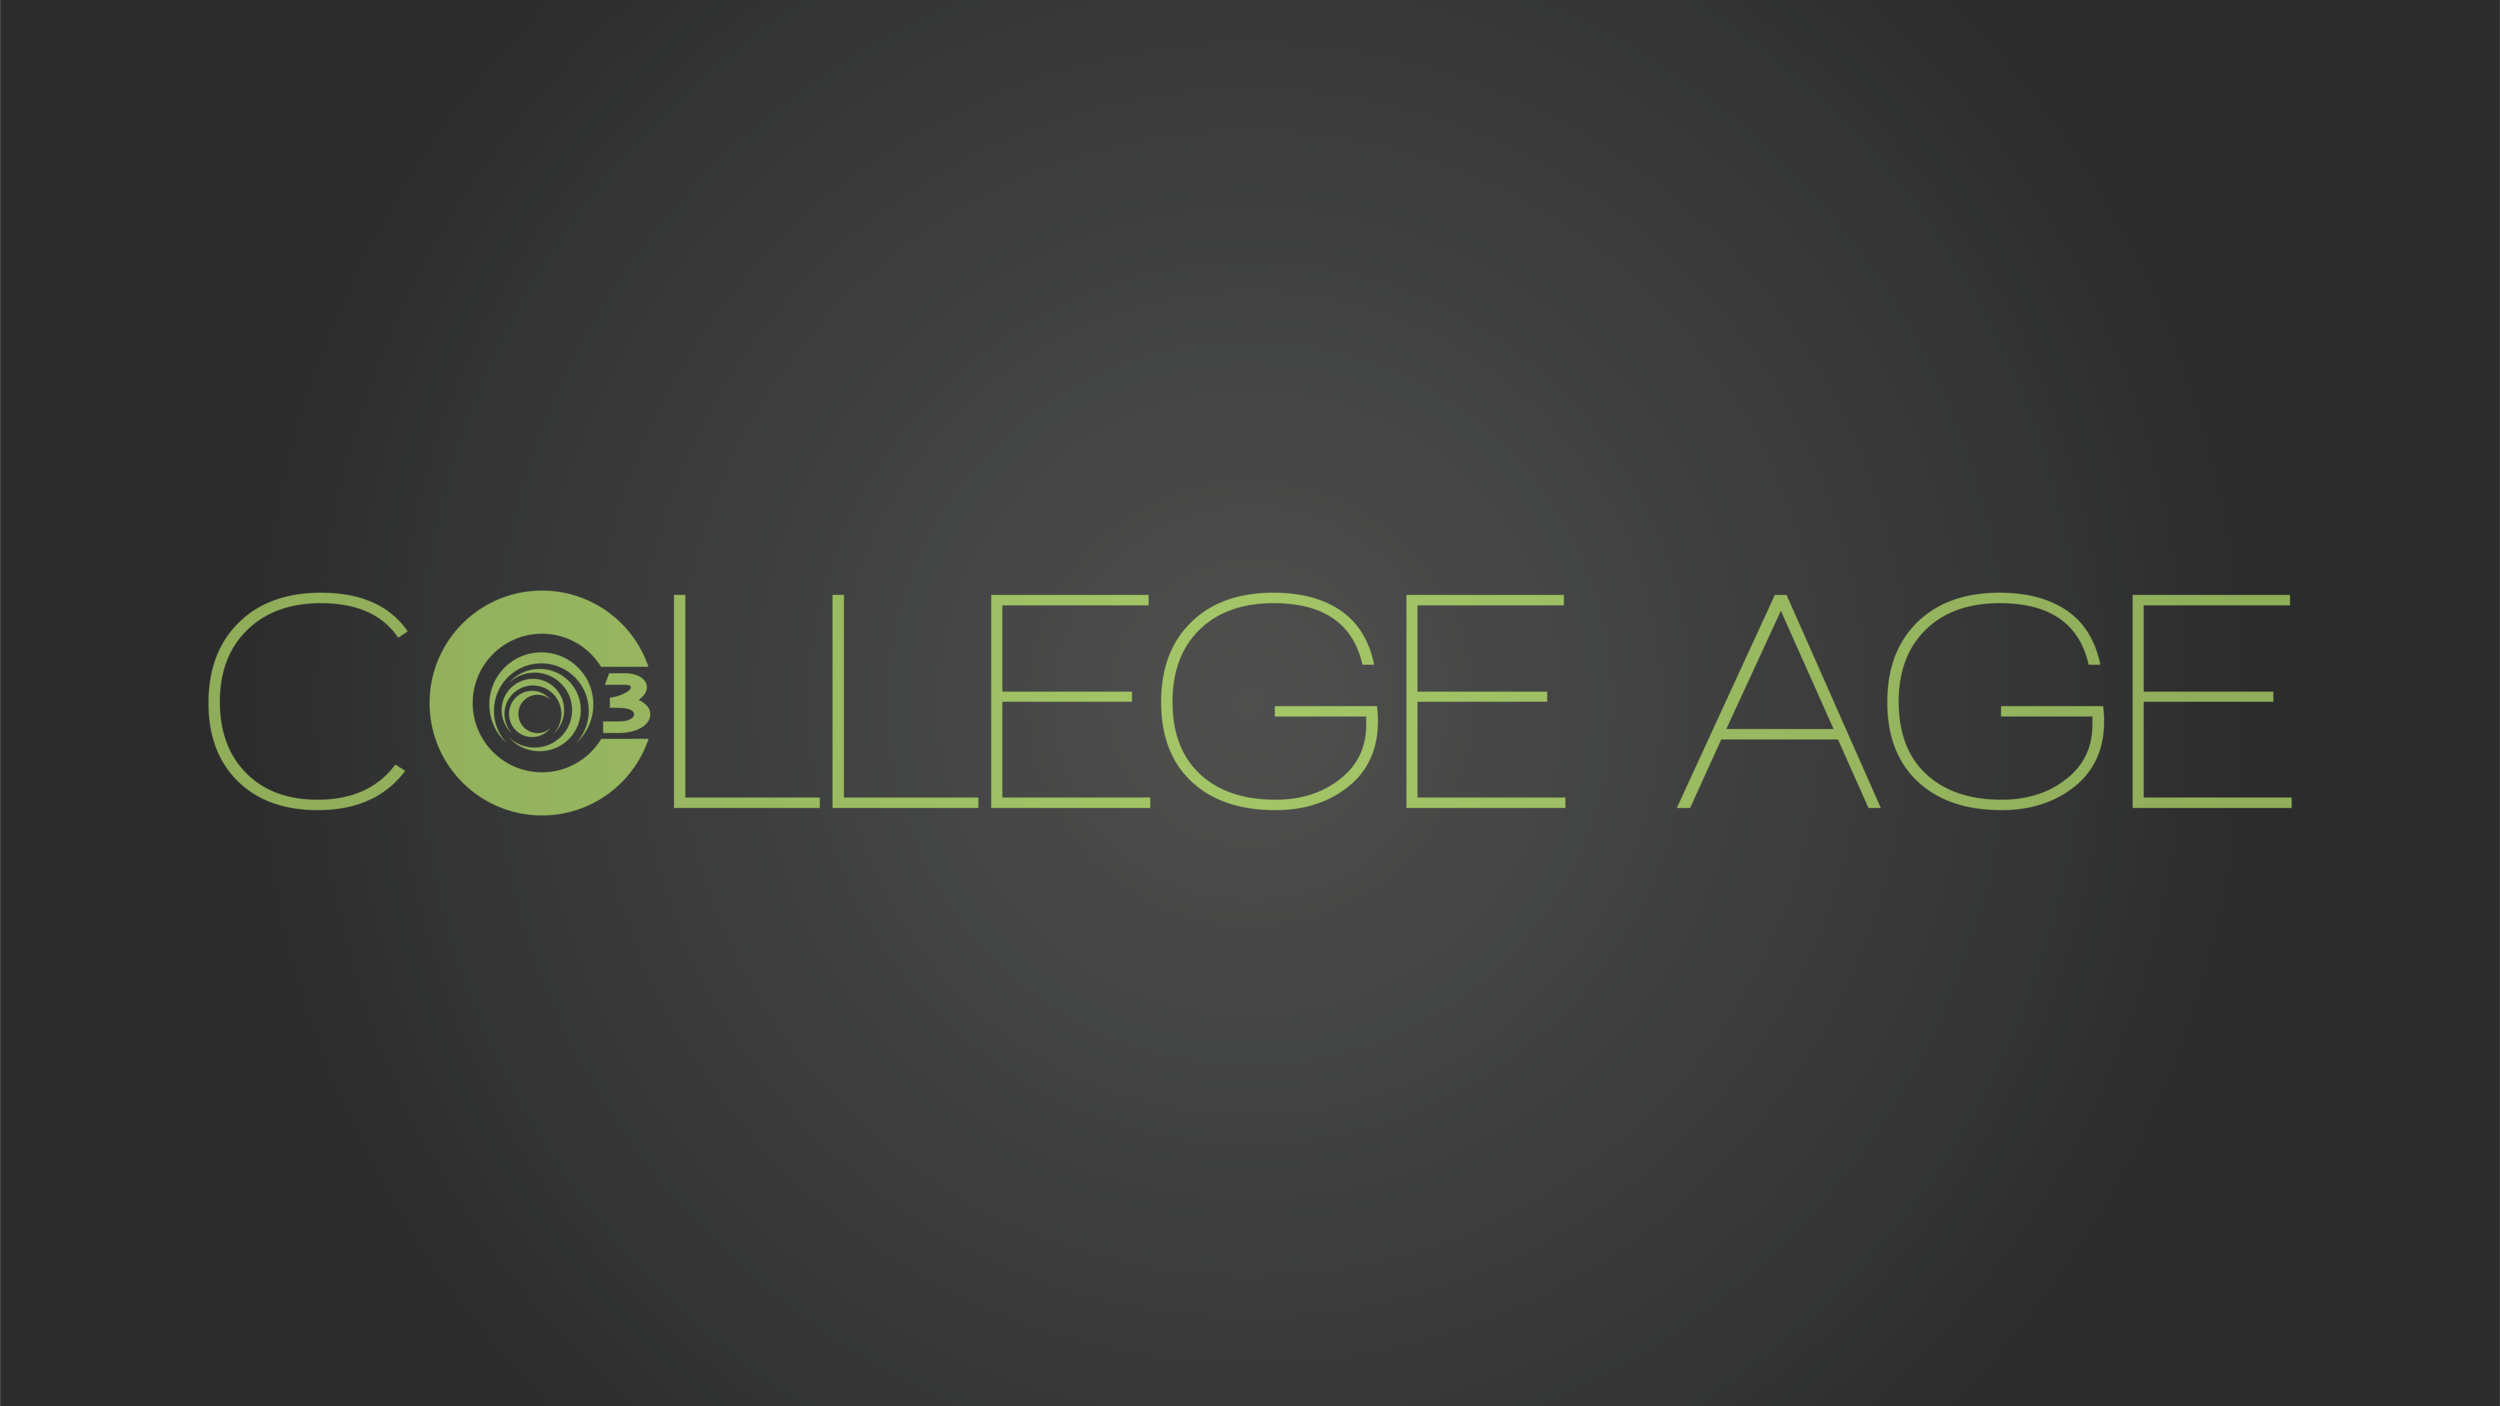 CollegeAgeImage_Gray.png